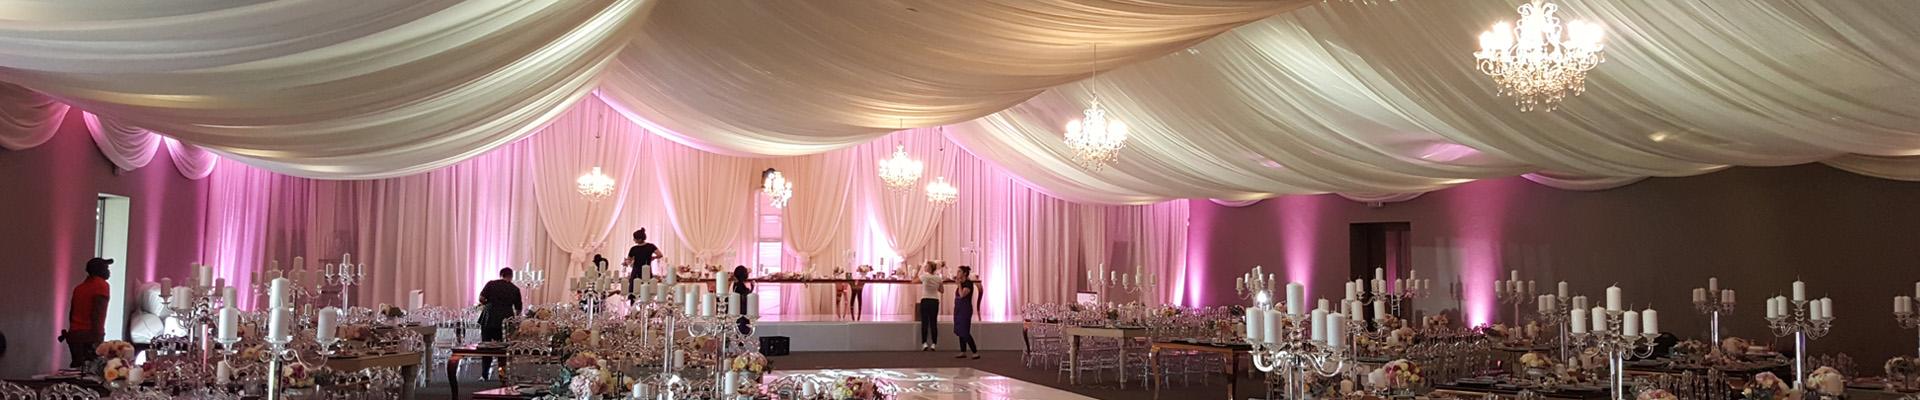 Wedding decor courses in johannesburg